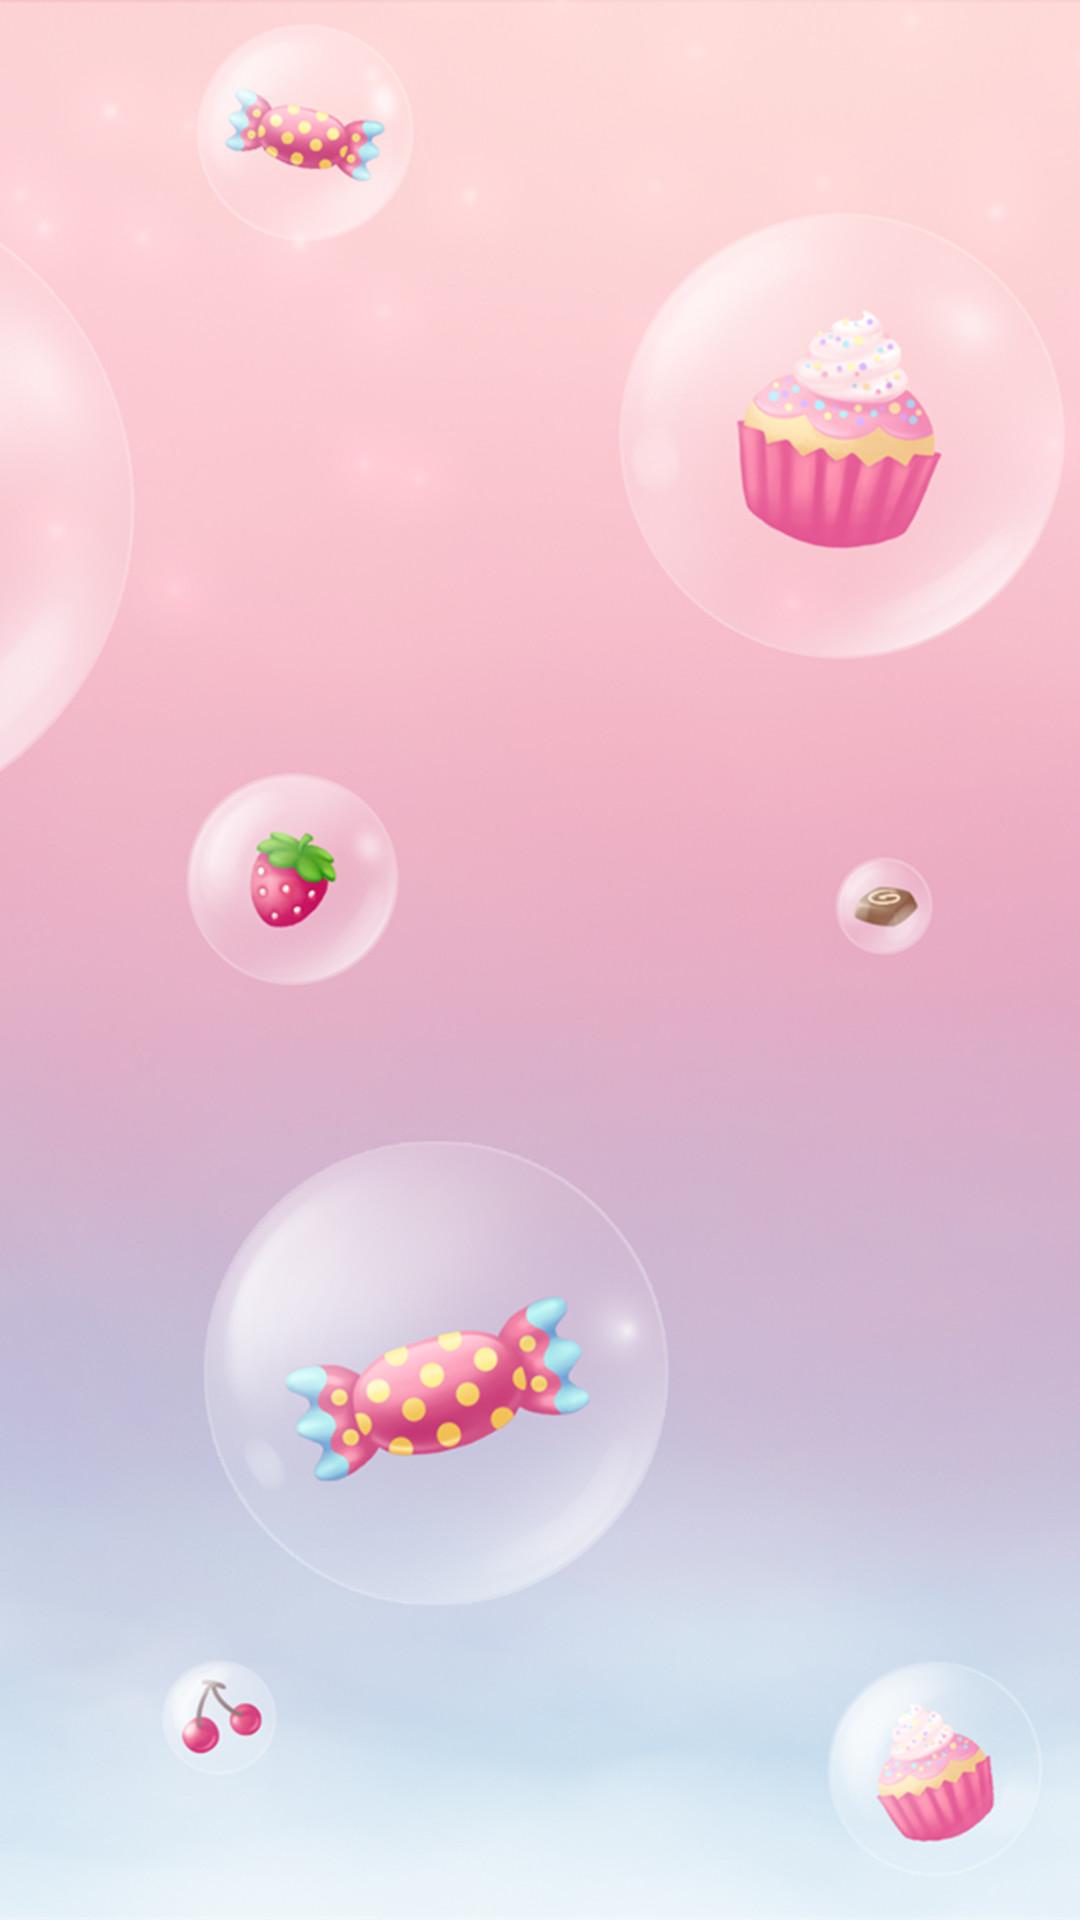 Cute Cupcake Background 183 ① Wallpapertag